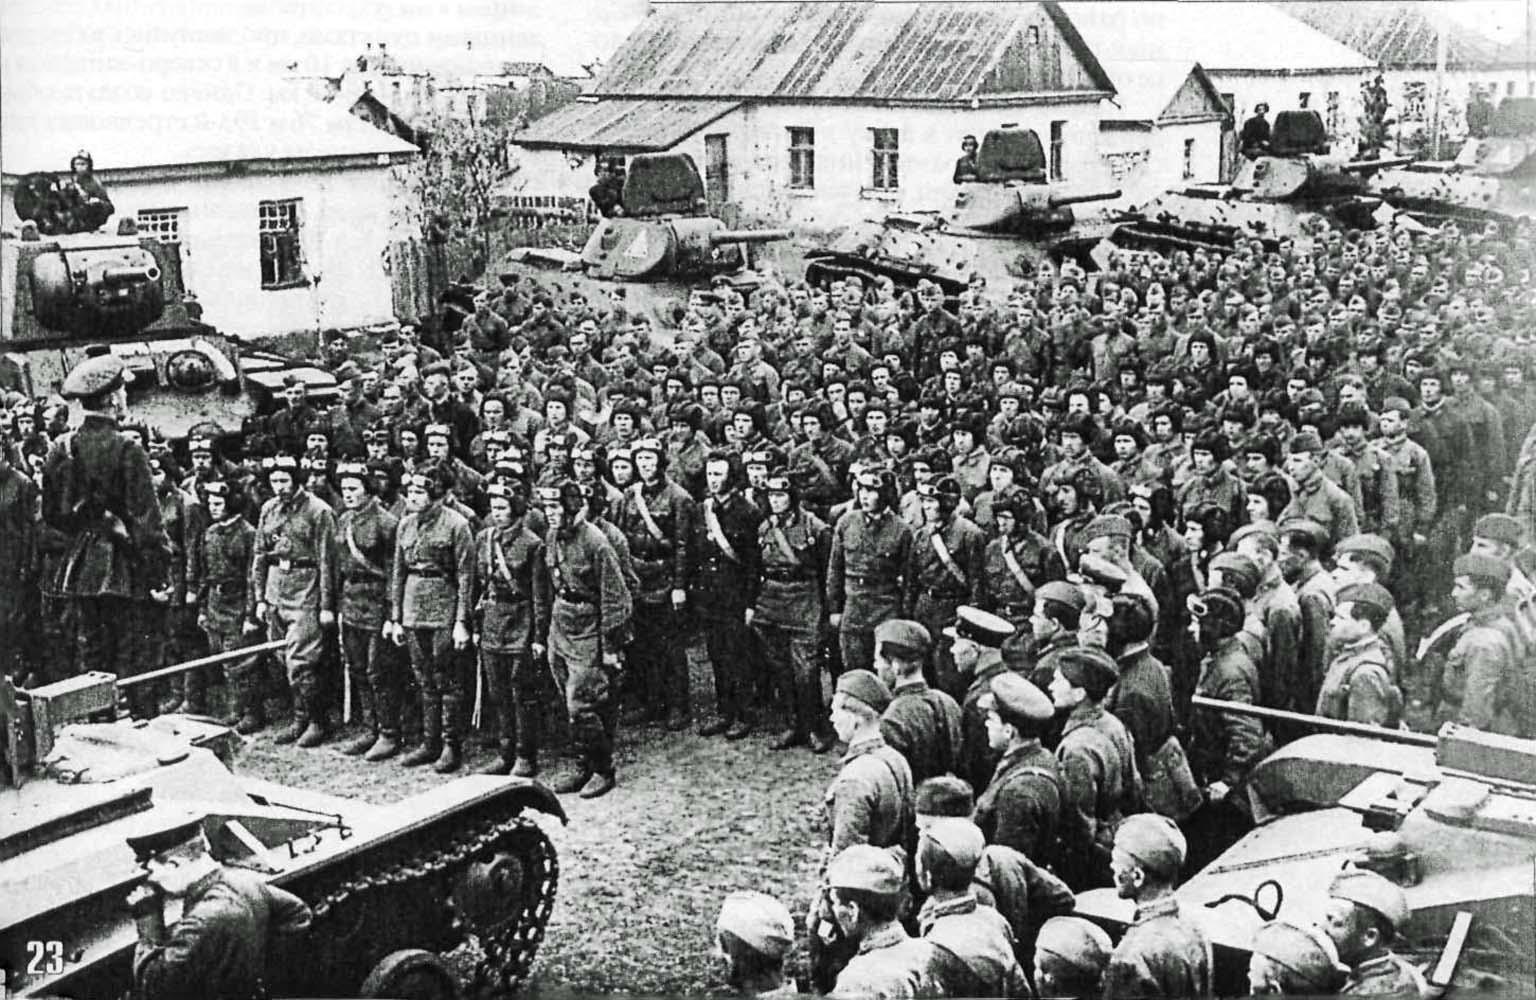 121st Tank Brigade